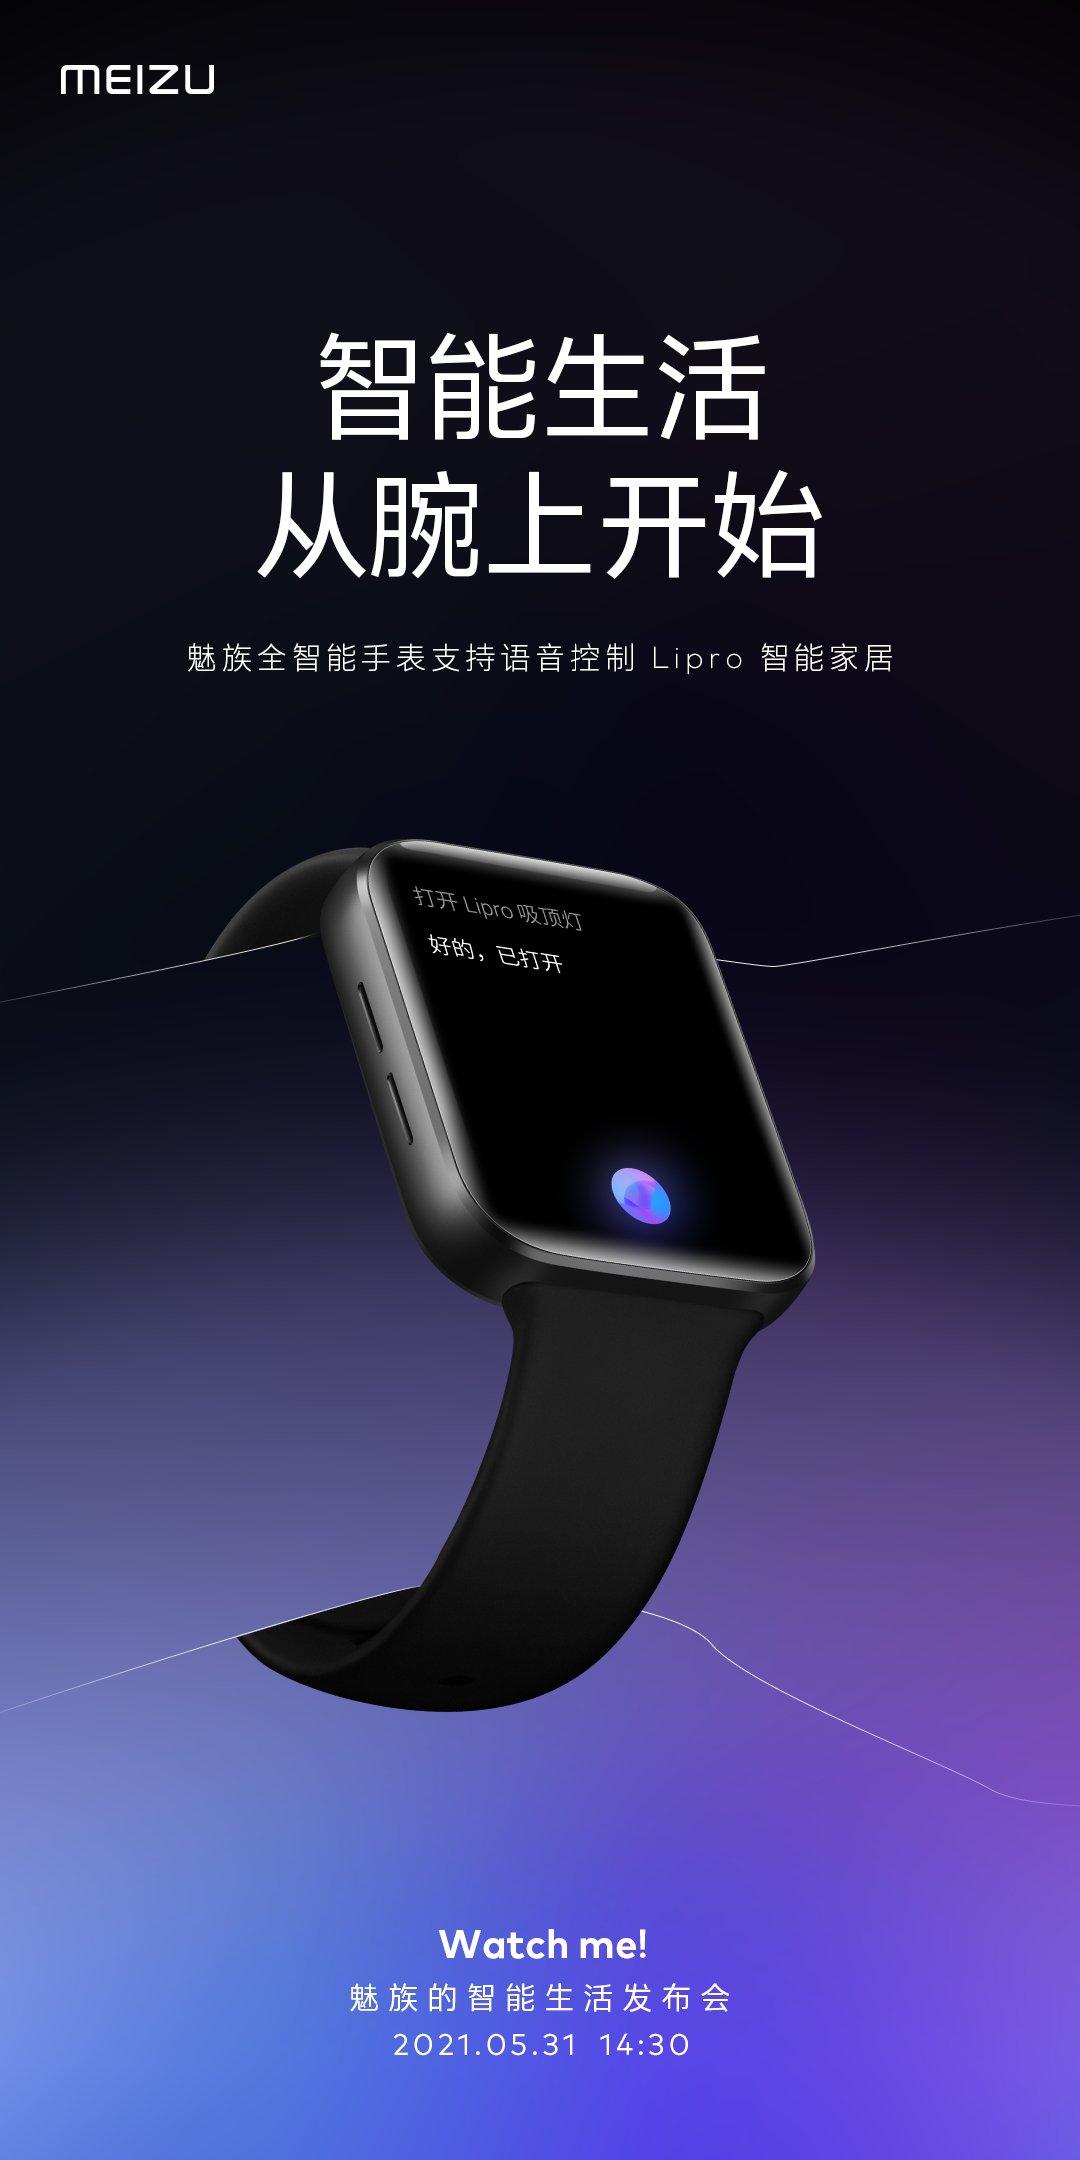 Meizu Watch Will Access HarmonyOS